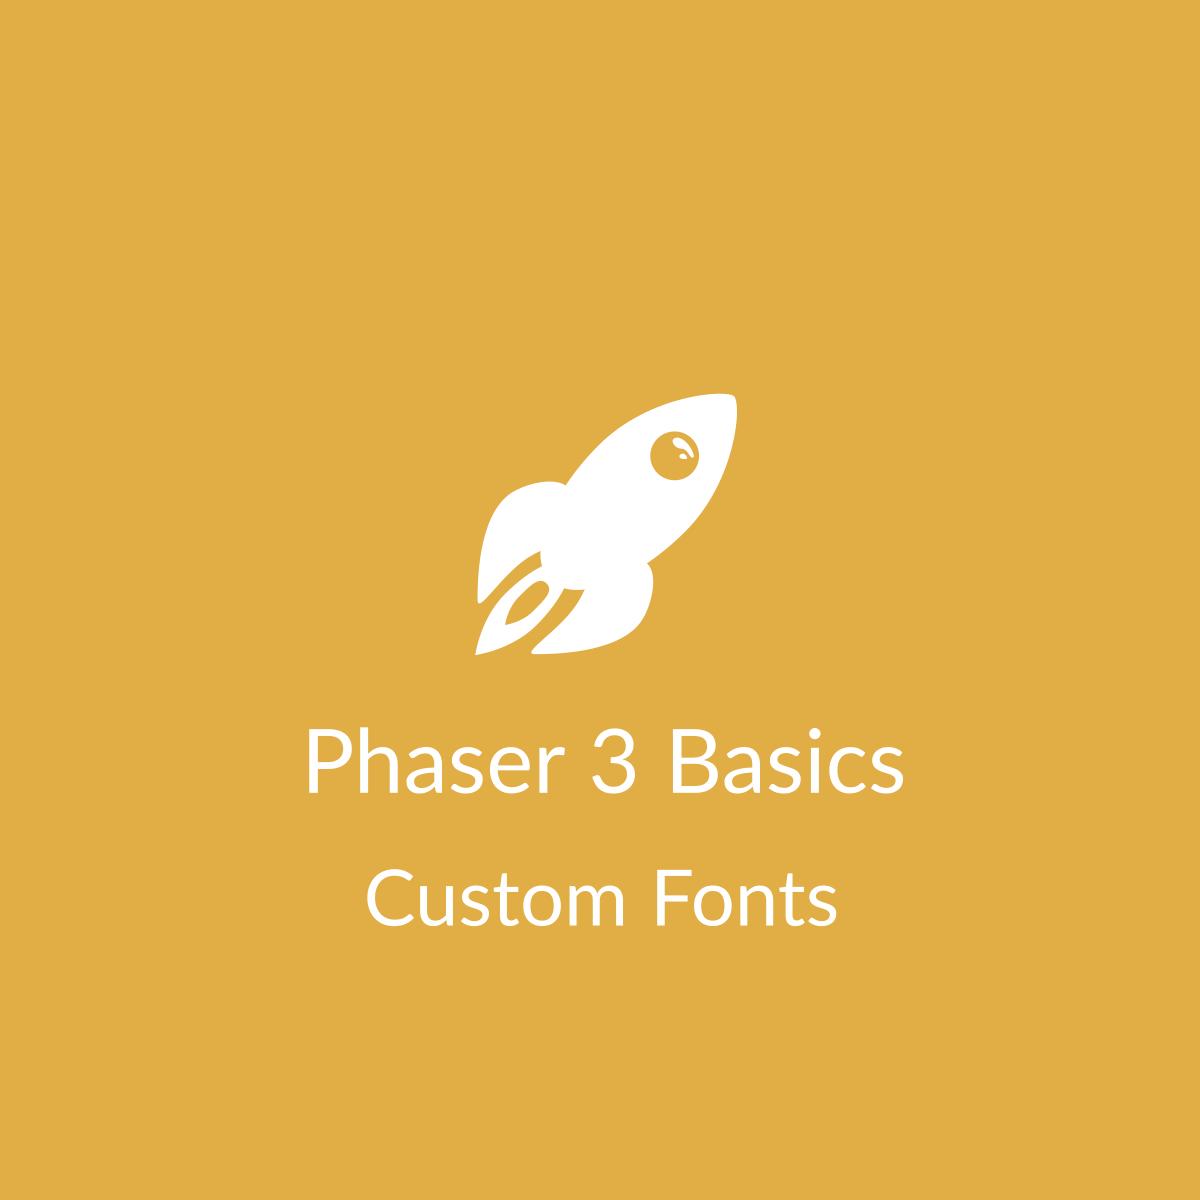 Phaser 3 Basics: Custom Fonts